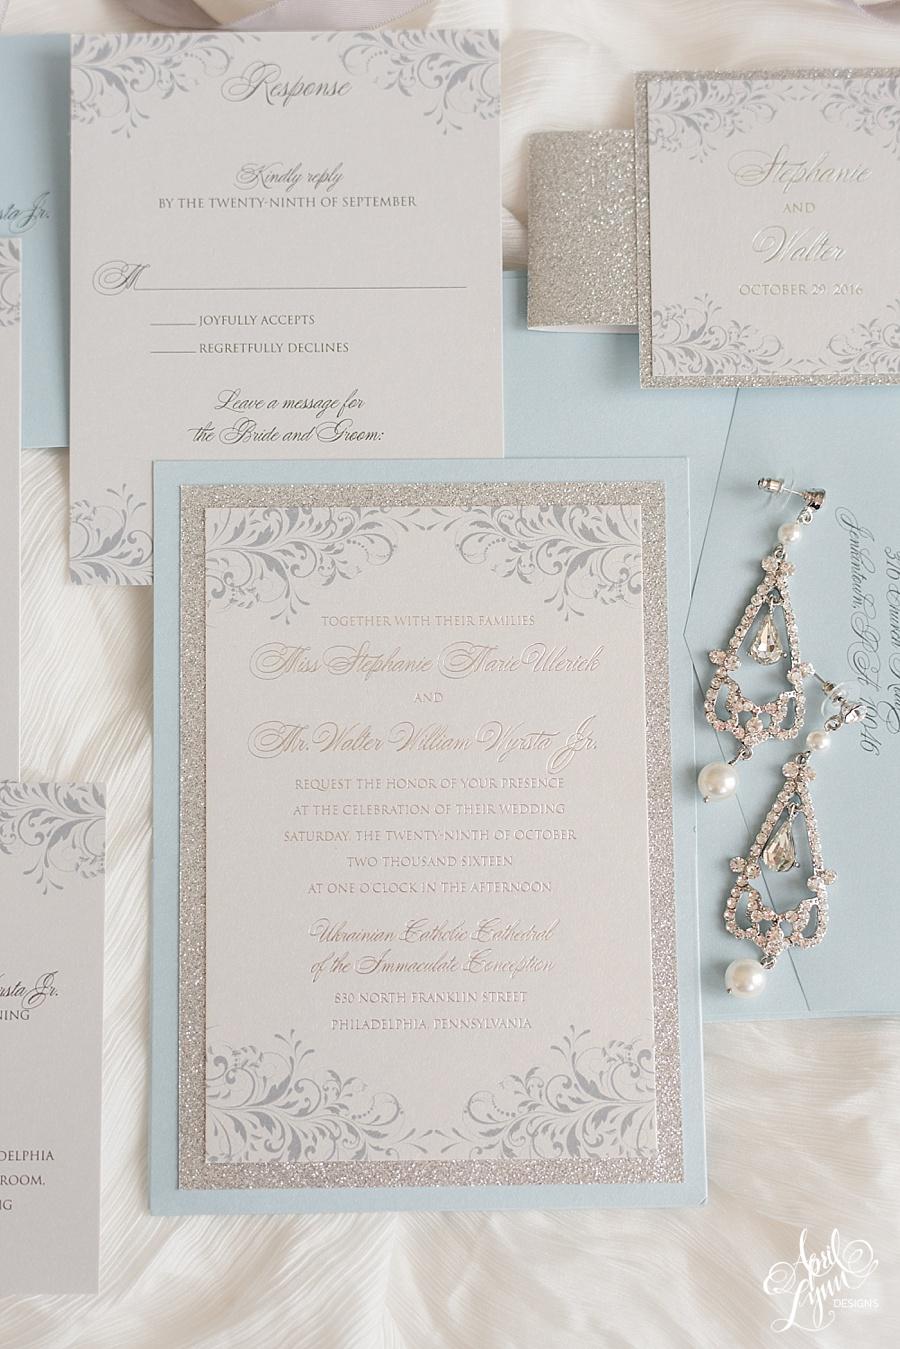 April_Lynn_Designs_Stephanie_Walter_Philadelphia_Pennsylvania_Wedding_Slate_Blue_Silver_Wedding_Invitation_Suite_Silver_Foil_Cescaphe_Event_Group_Tendenza